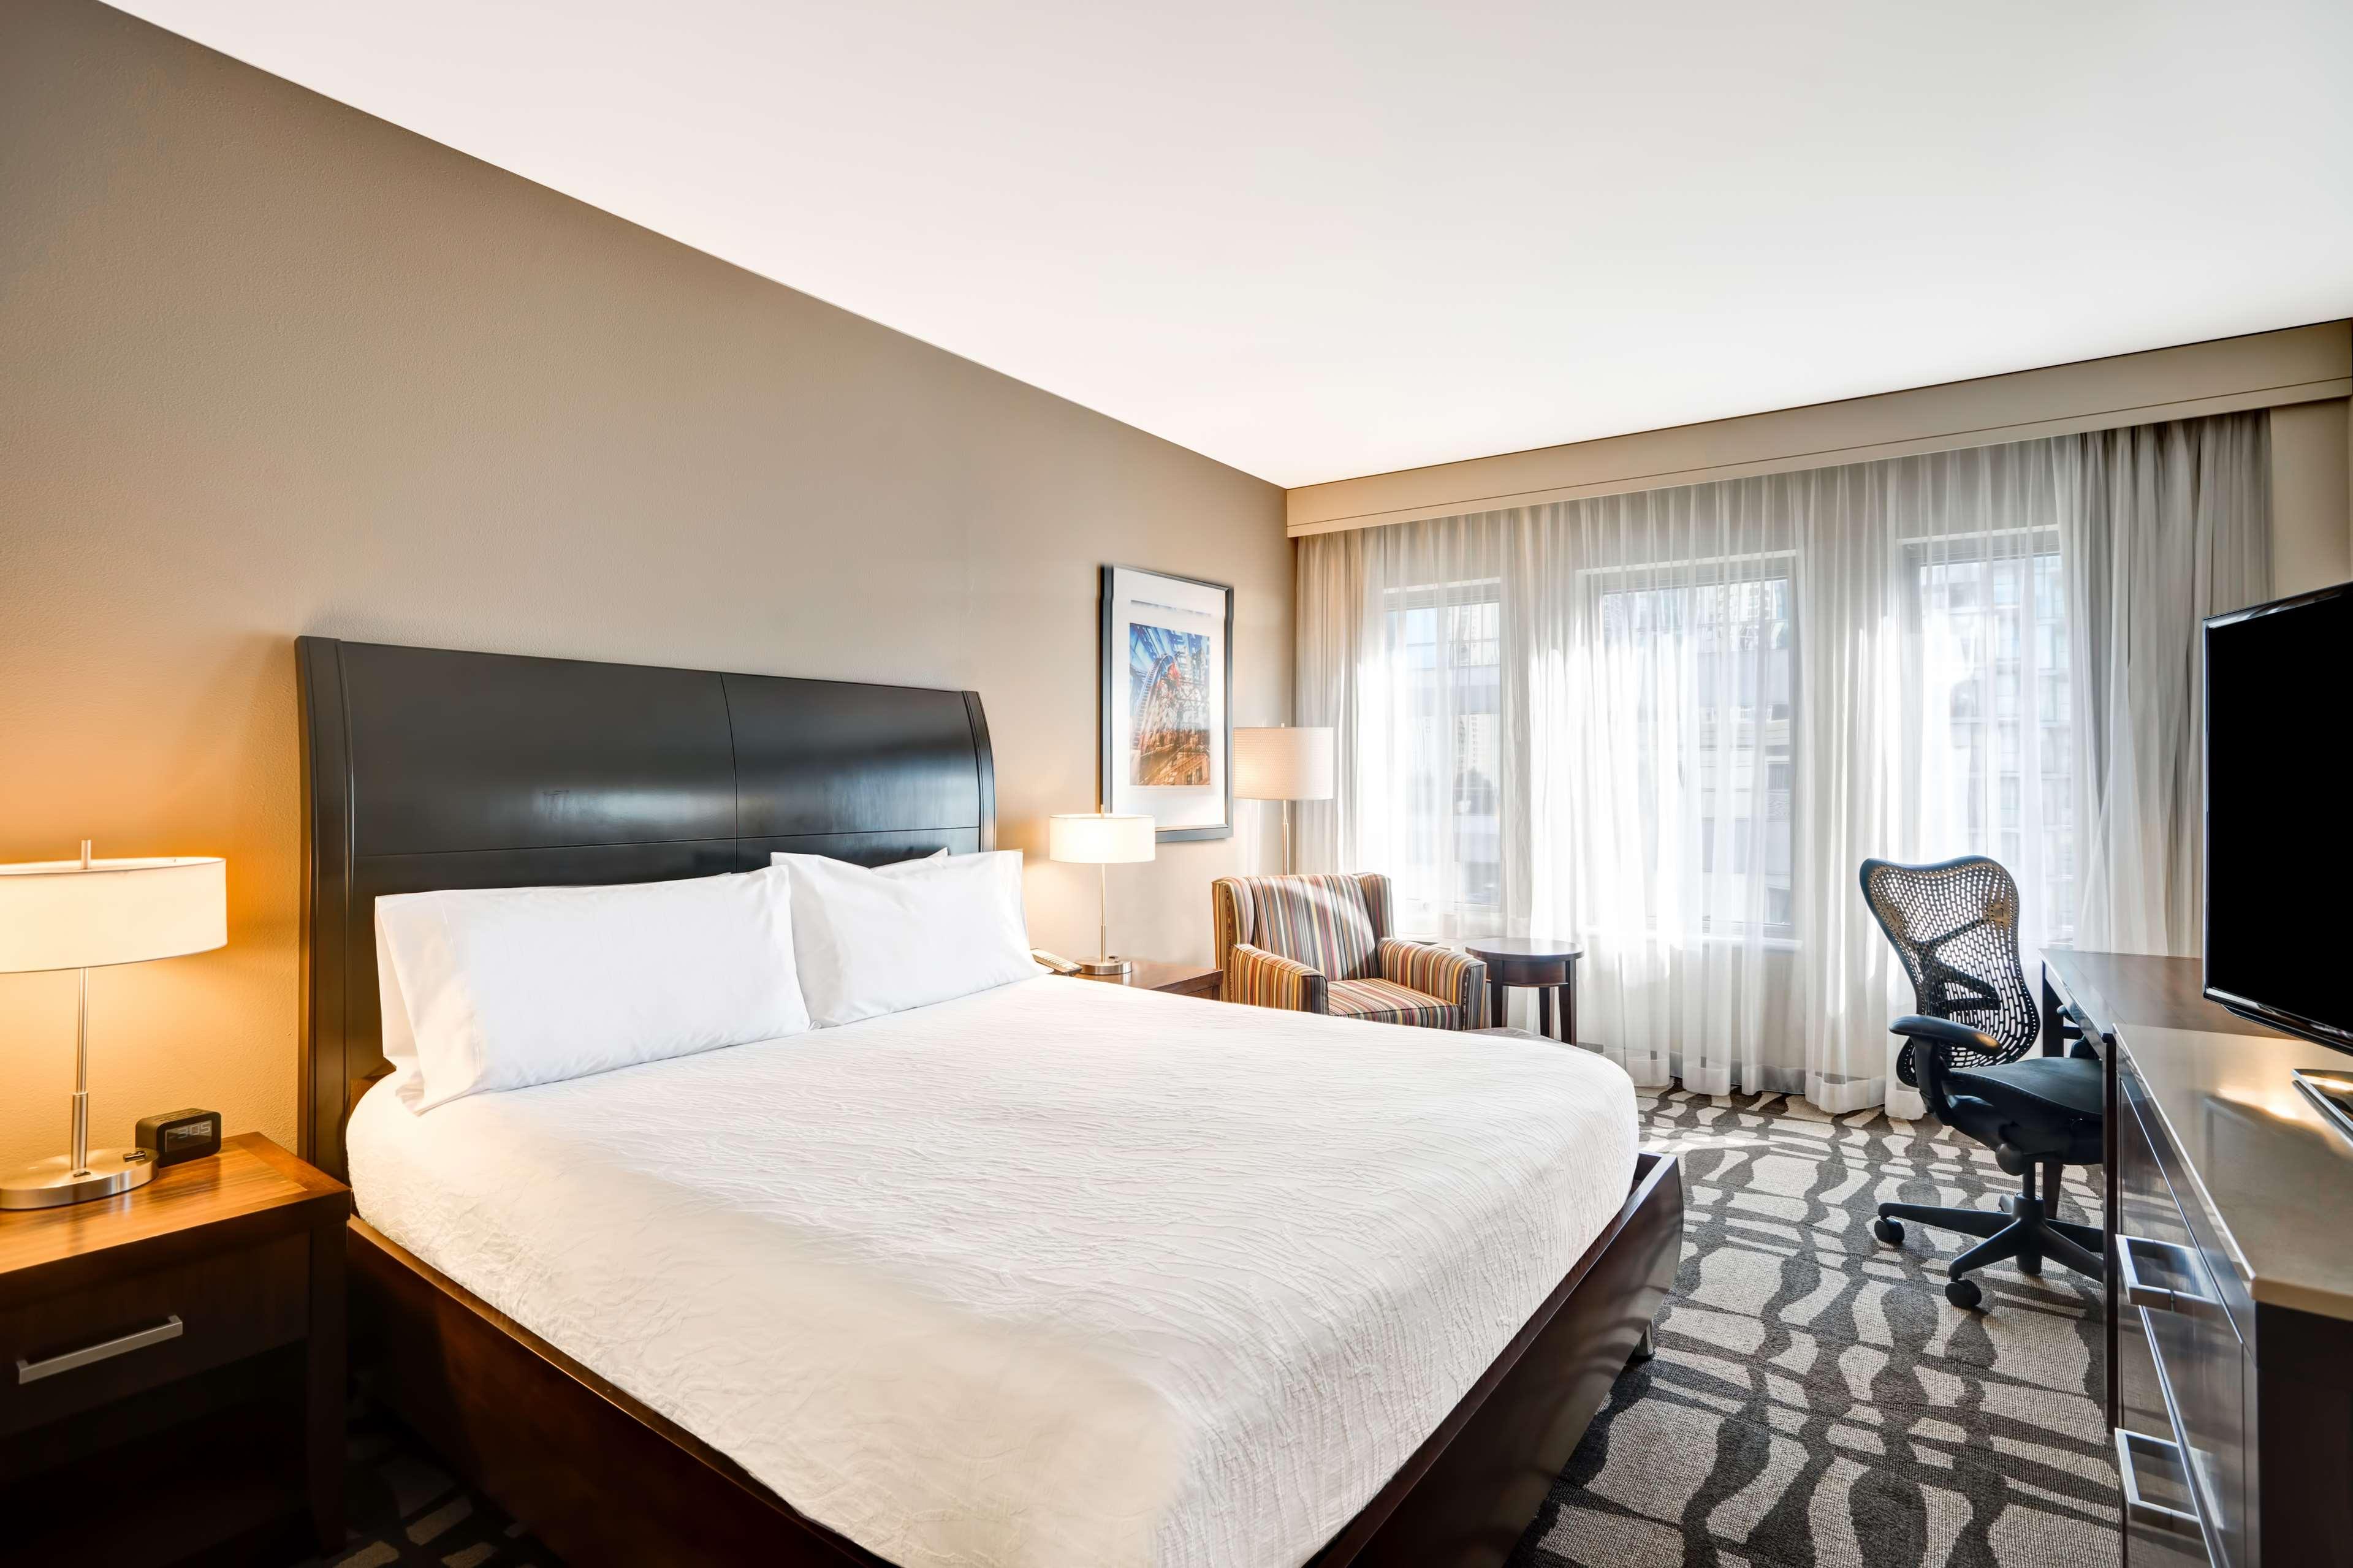 Hilton Garden Inn Chicago Downtown/Magnificent Mile image 32